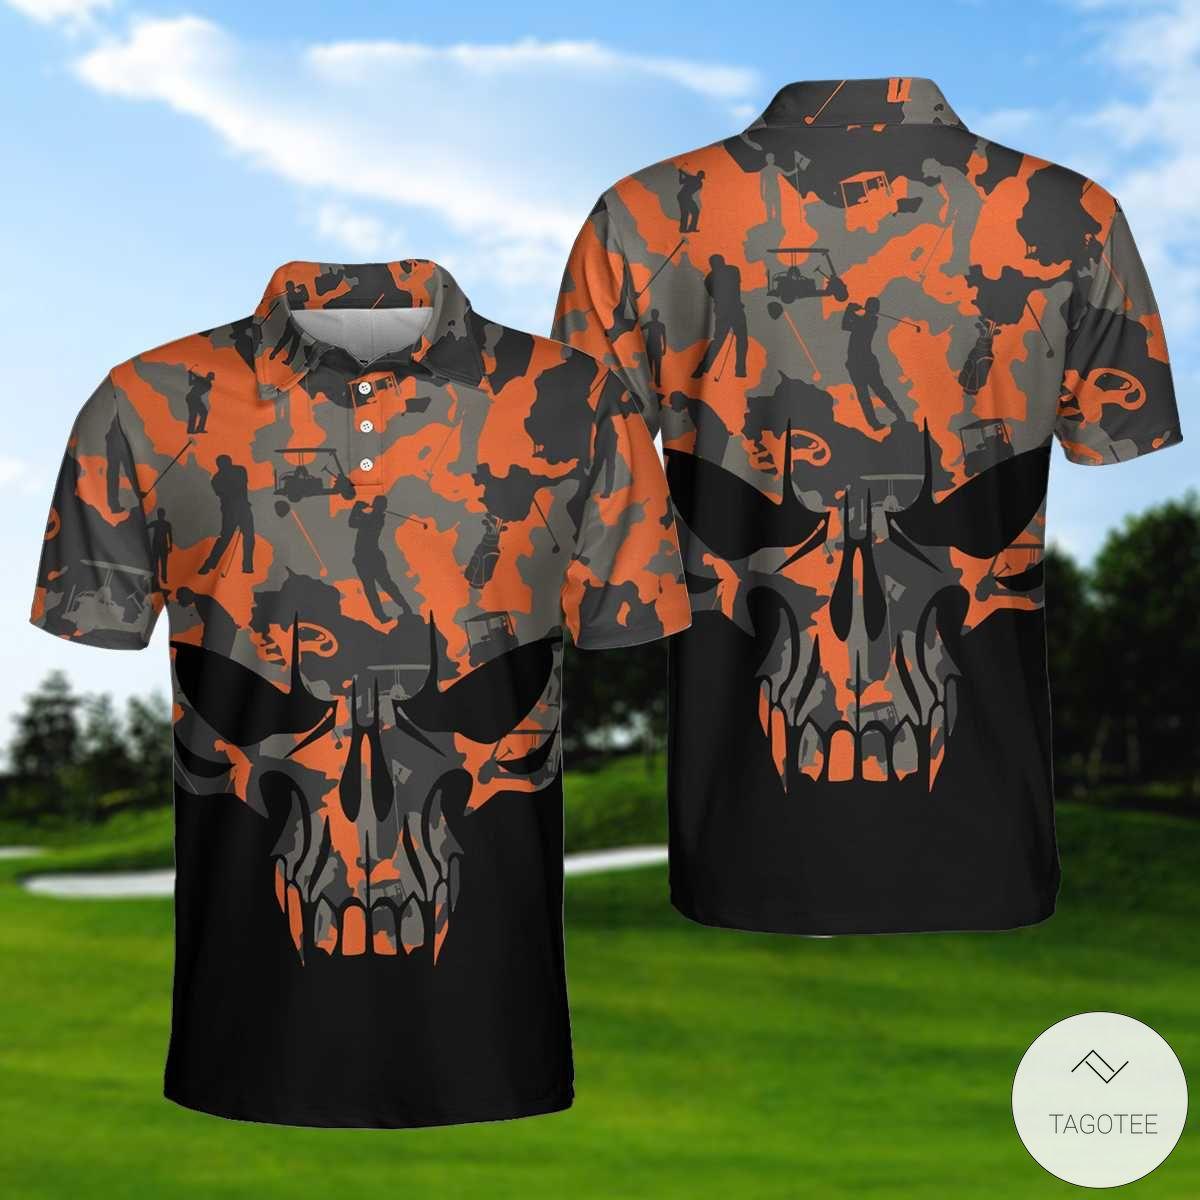 Orange Camouflage Golf Set Skull Golf Polo Shirtx